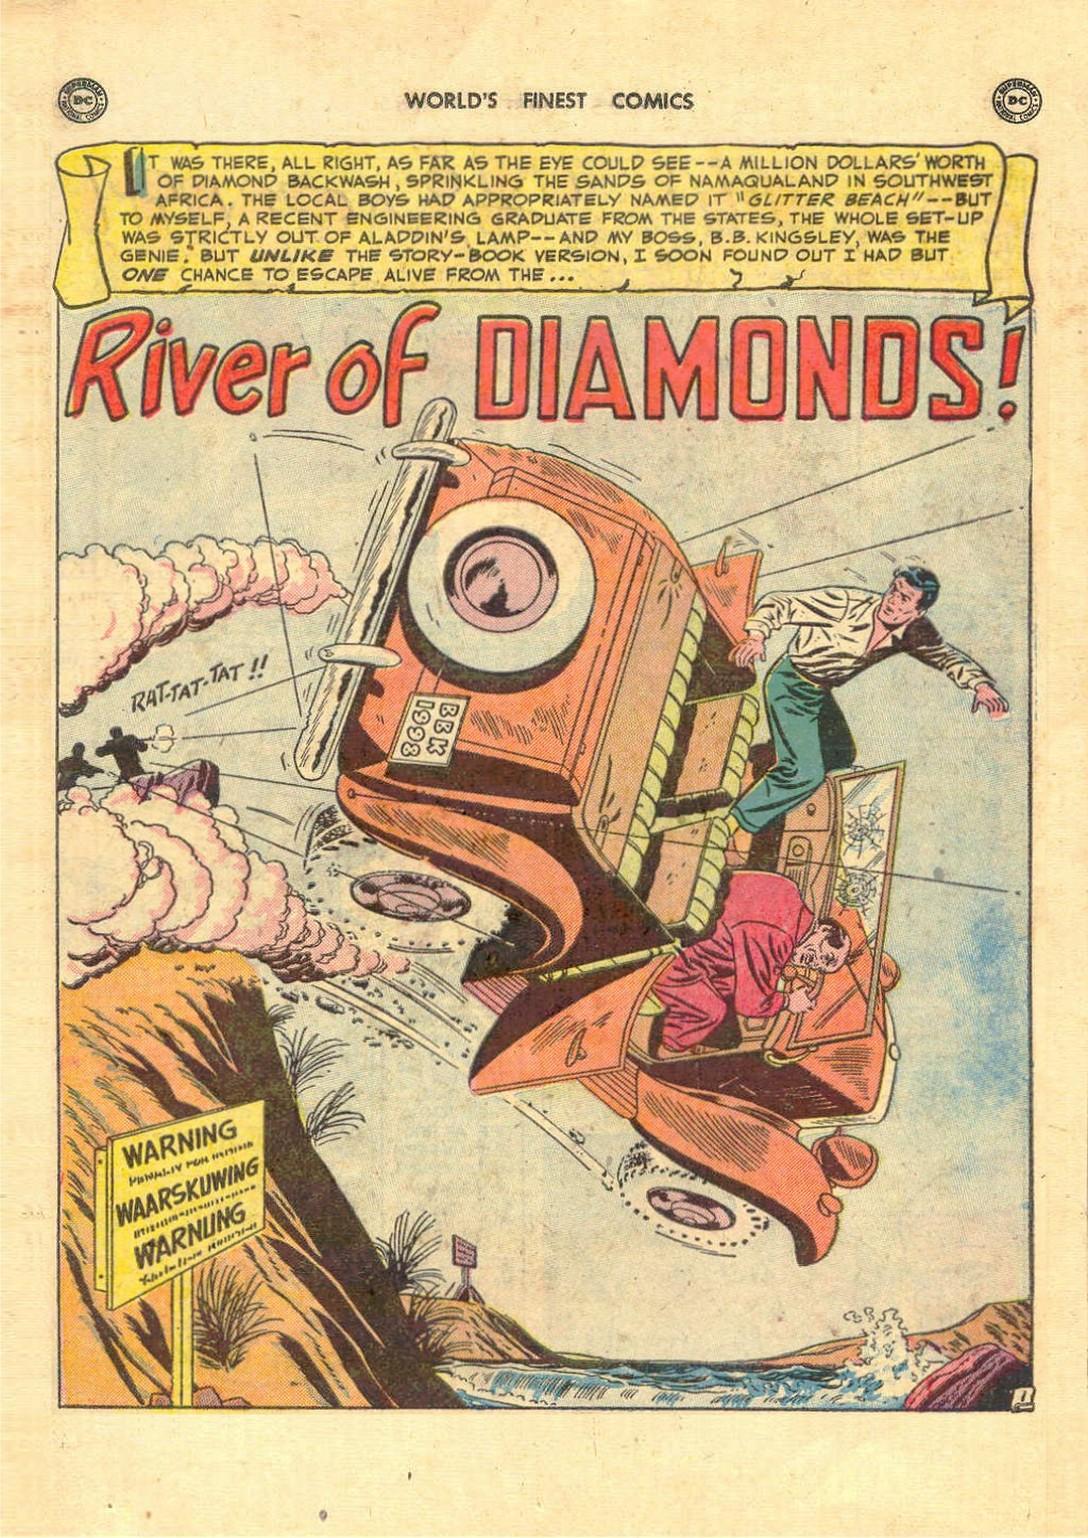 Read online World's Finest Comics comic -  Issue #52 - 27